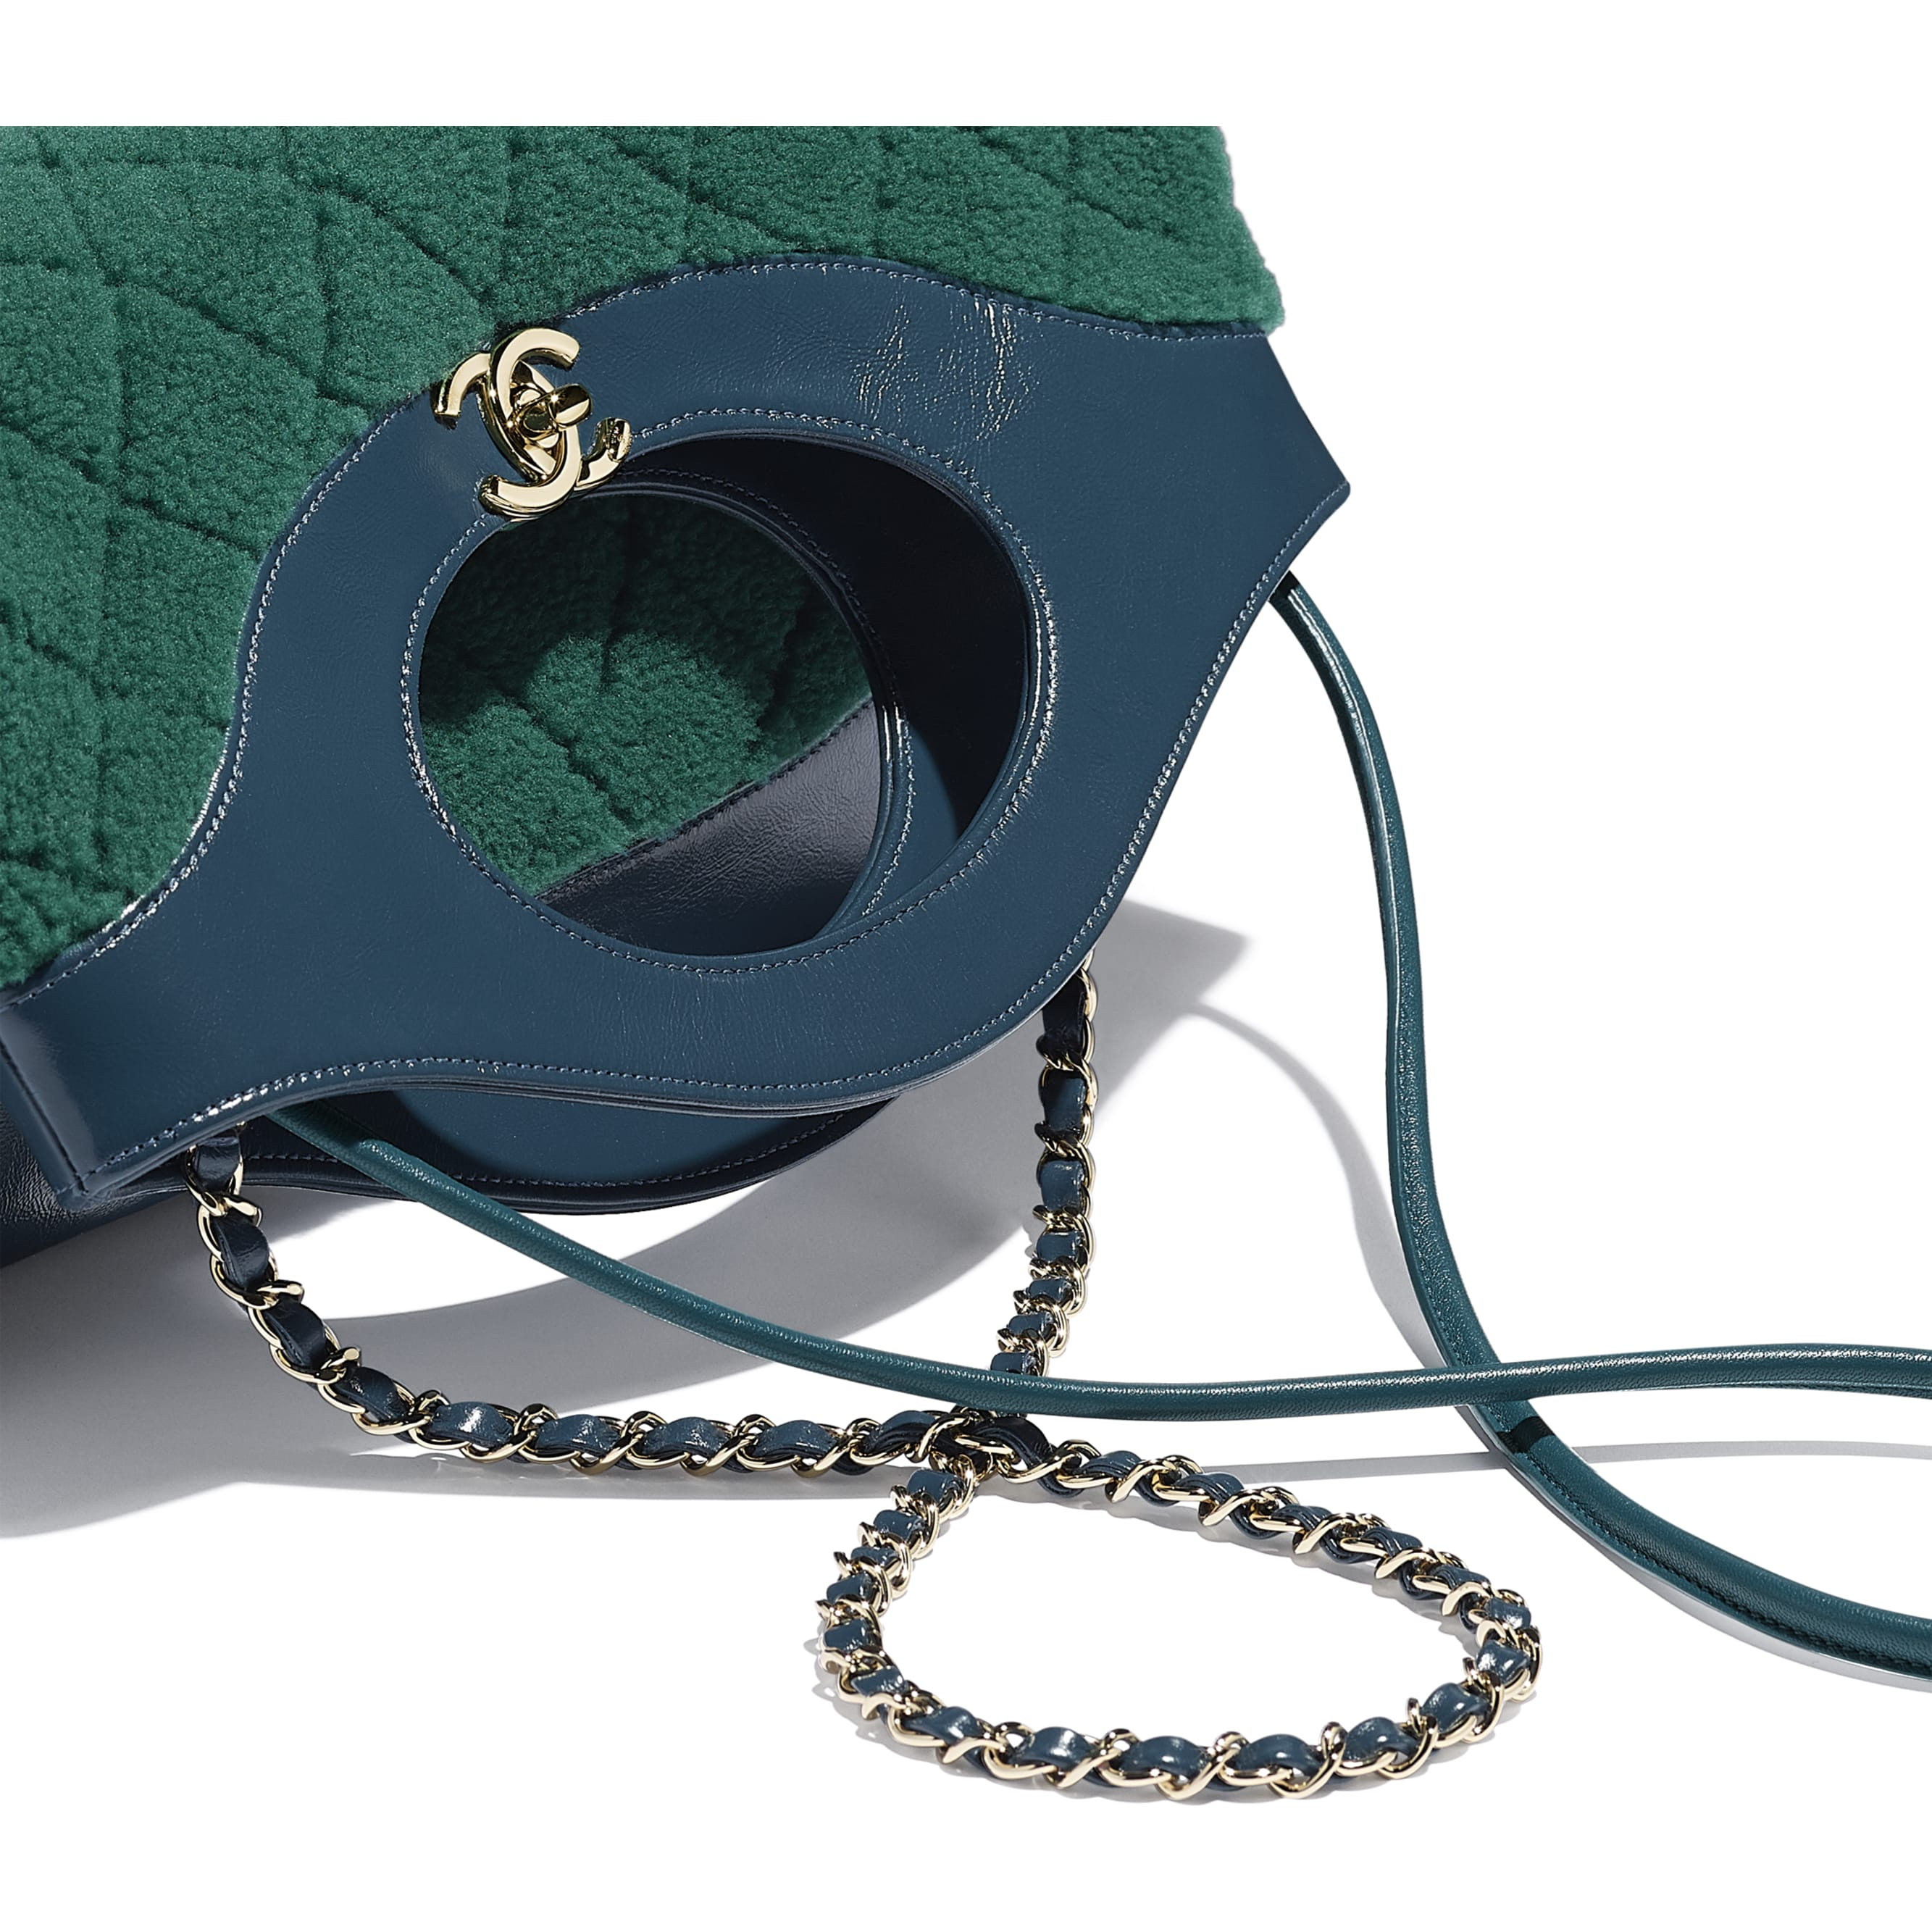 CHANEL 31 Shopping Bag - Green & Blue - Shearling Sheepskin, Calfskin & Gold-Tone Metal - Extra view - see standard sized version